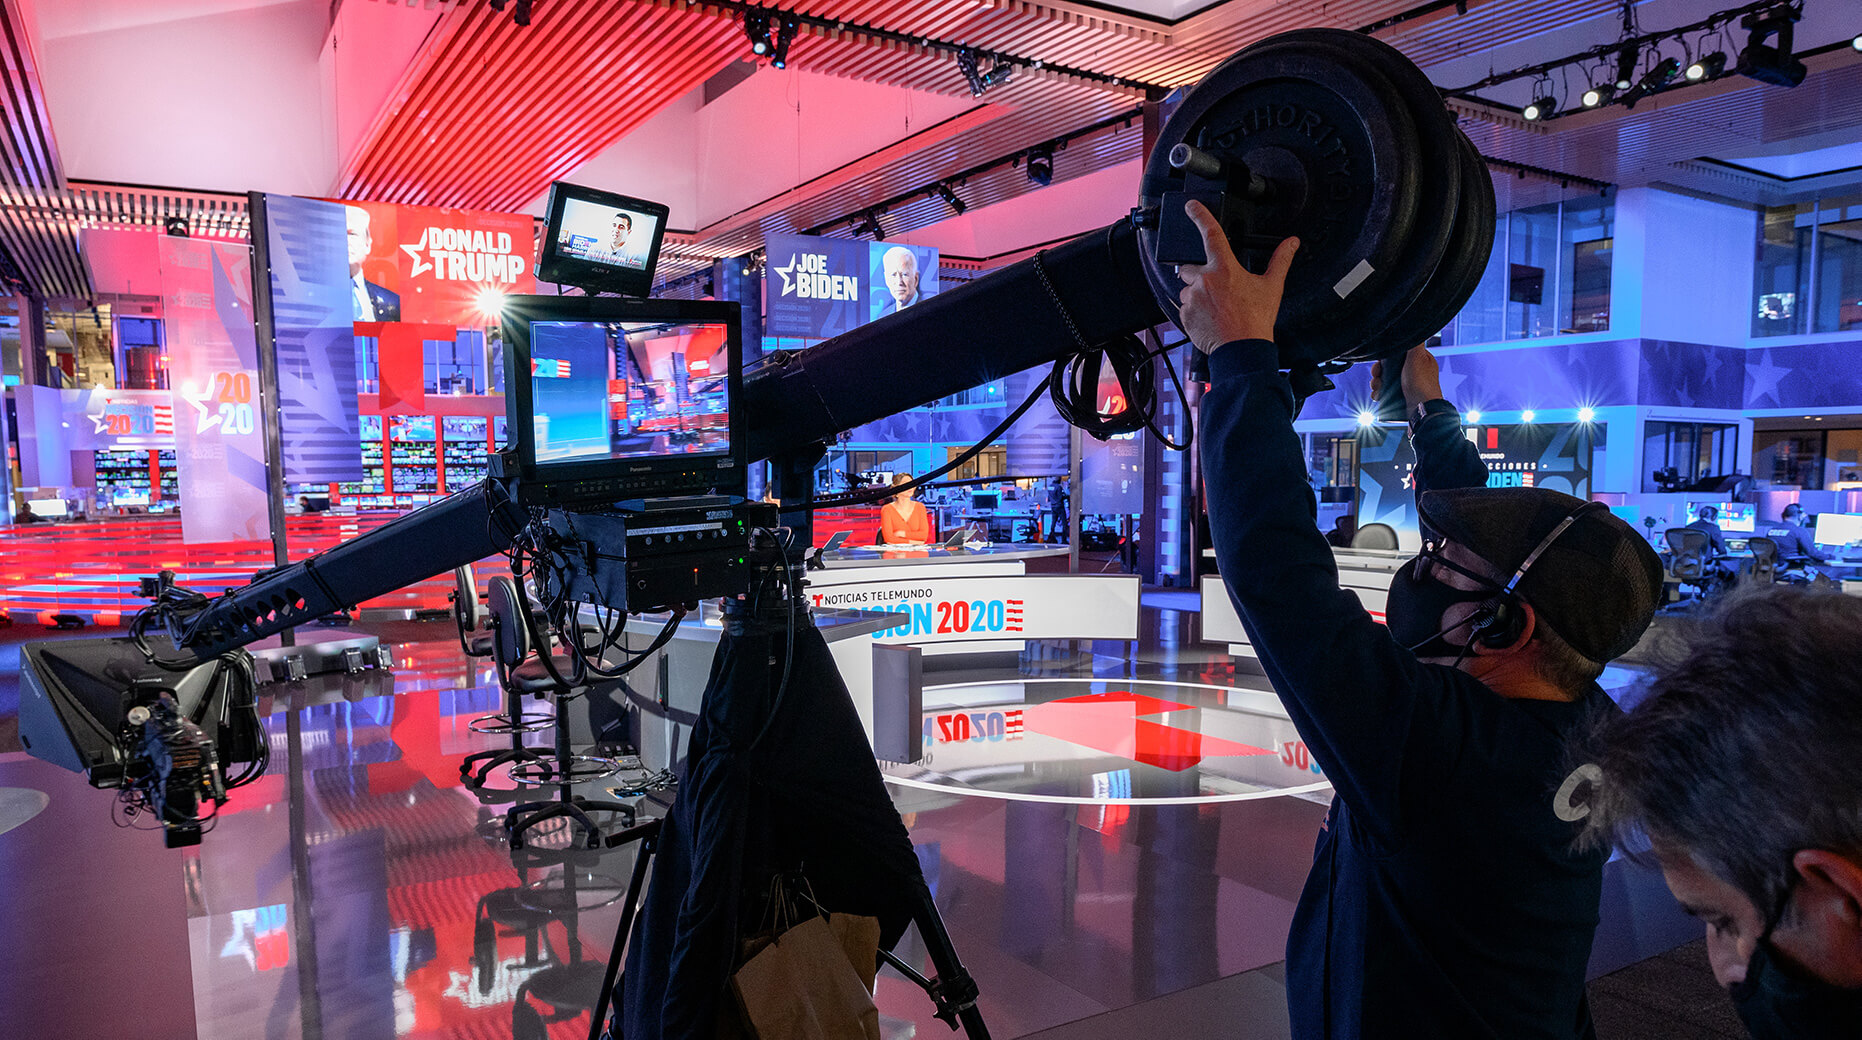 behind the scenes at Telemundo on election night 2020